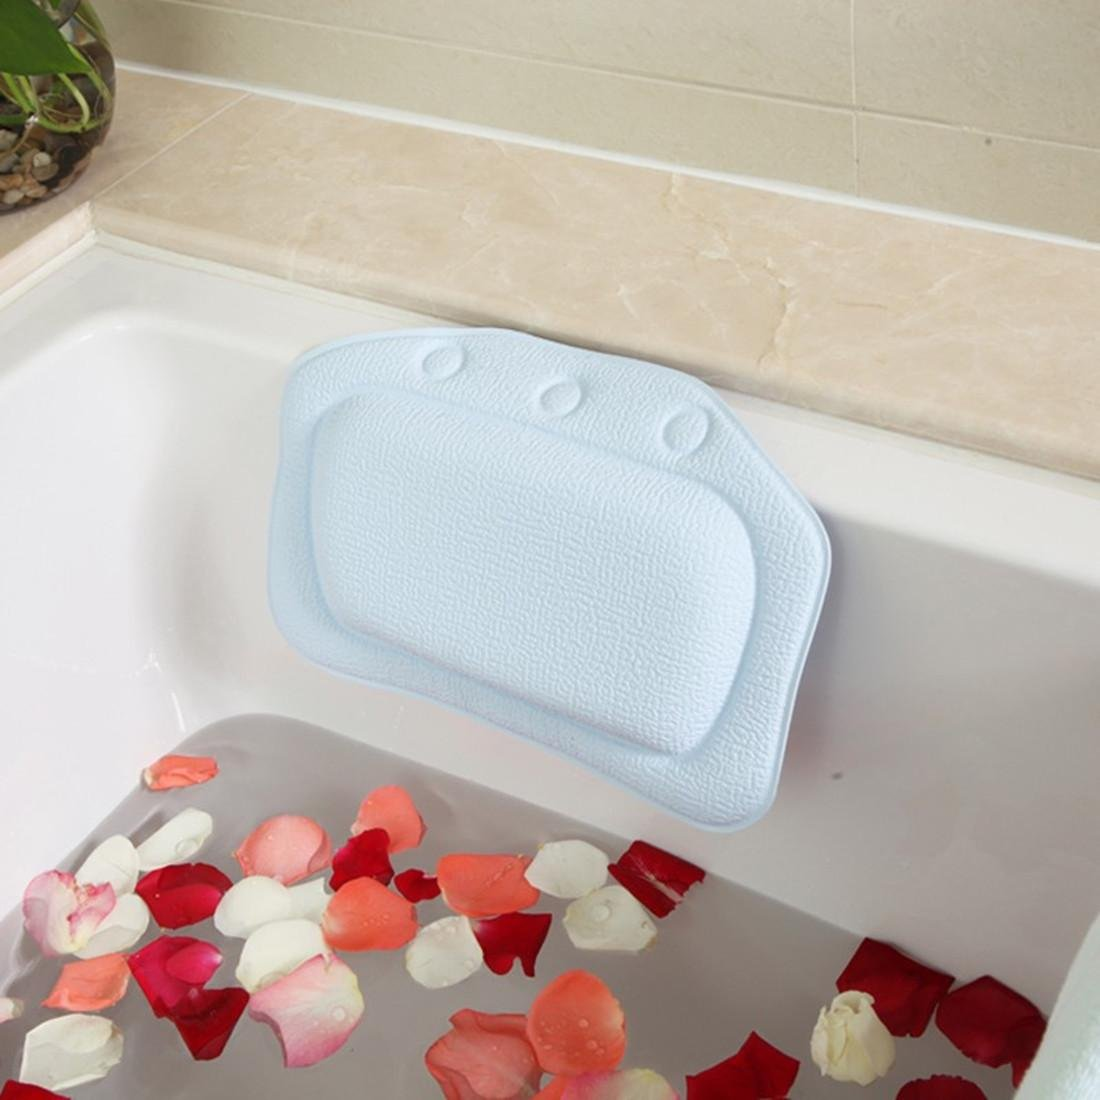 Bath pillow bathtub pillow bath backrest headrest suction cup PVC waterproof amc spa bath Sky blue Bathroom supplies 21*31cm. by deefullshop (Image #2)